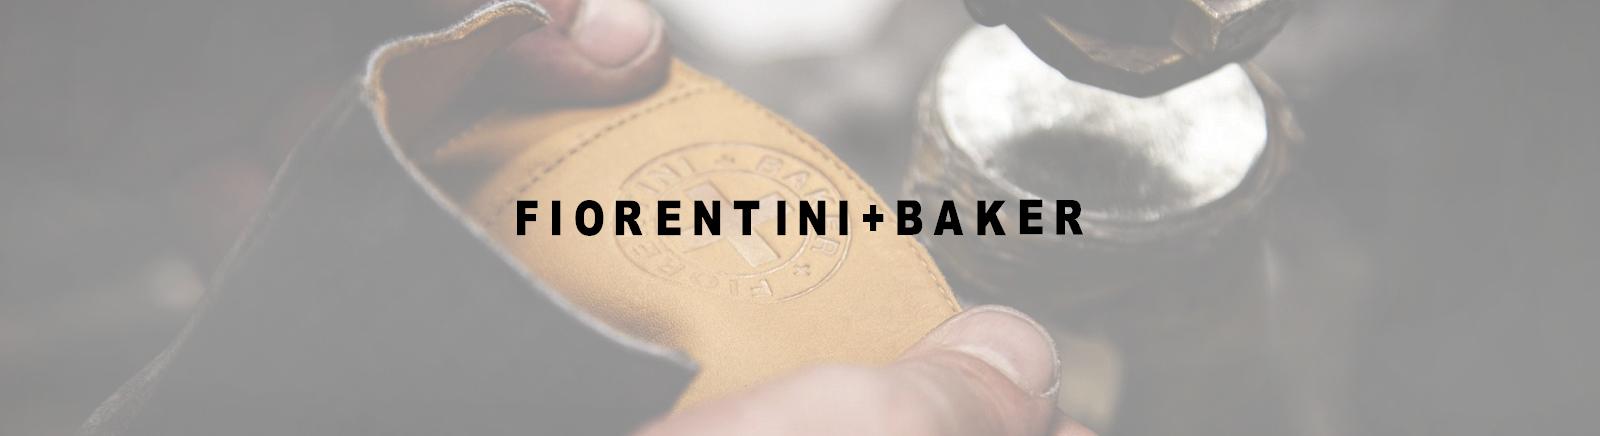 Fiorentini + Baker Herrenschuhe online entdecken im Juppen Shop